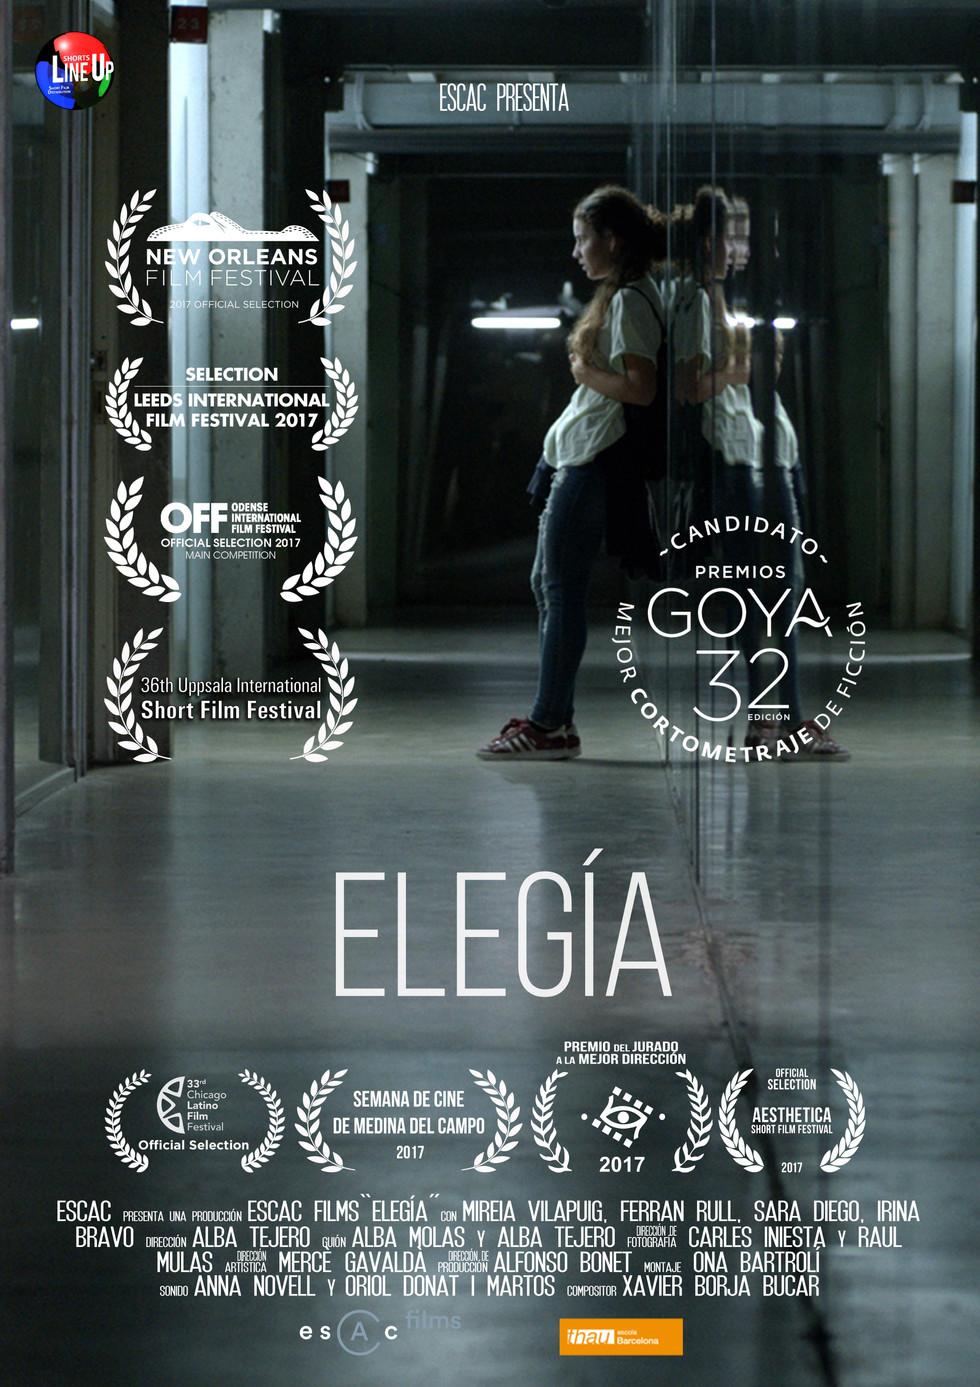 ELEGIA_POSTER-05-(A)_lq2.jpg